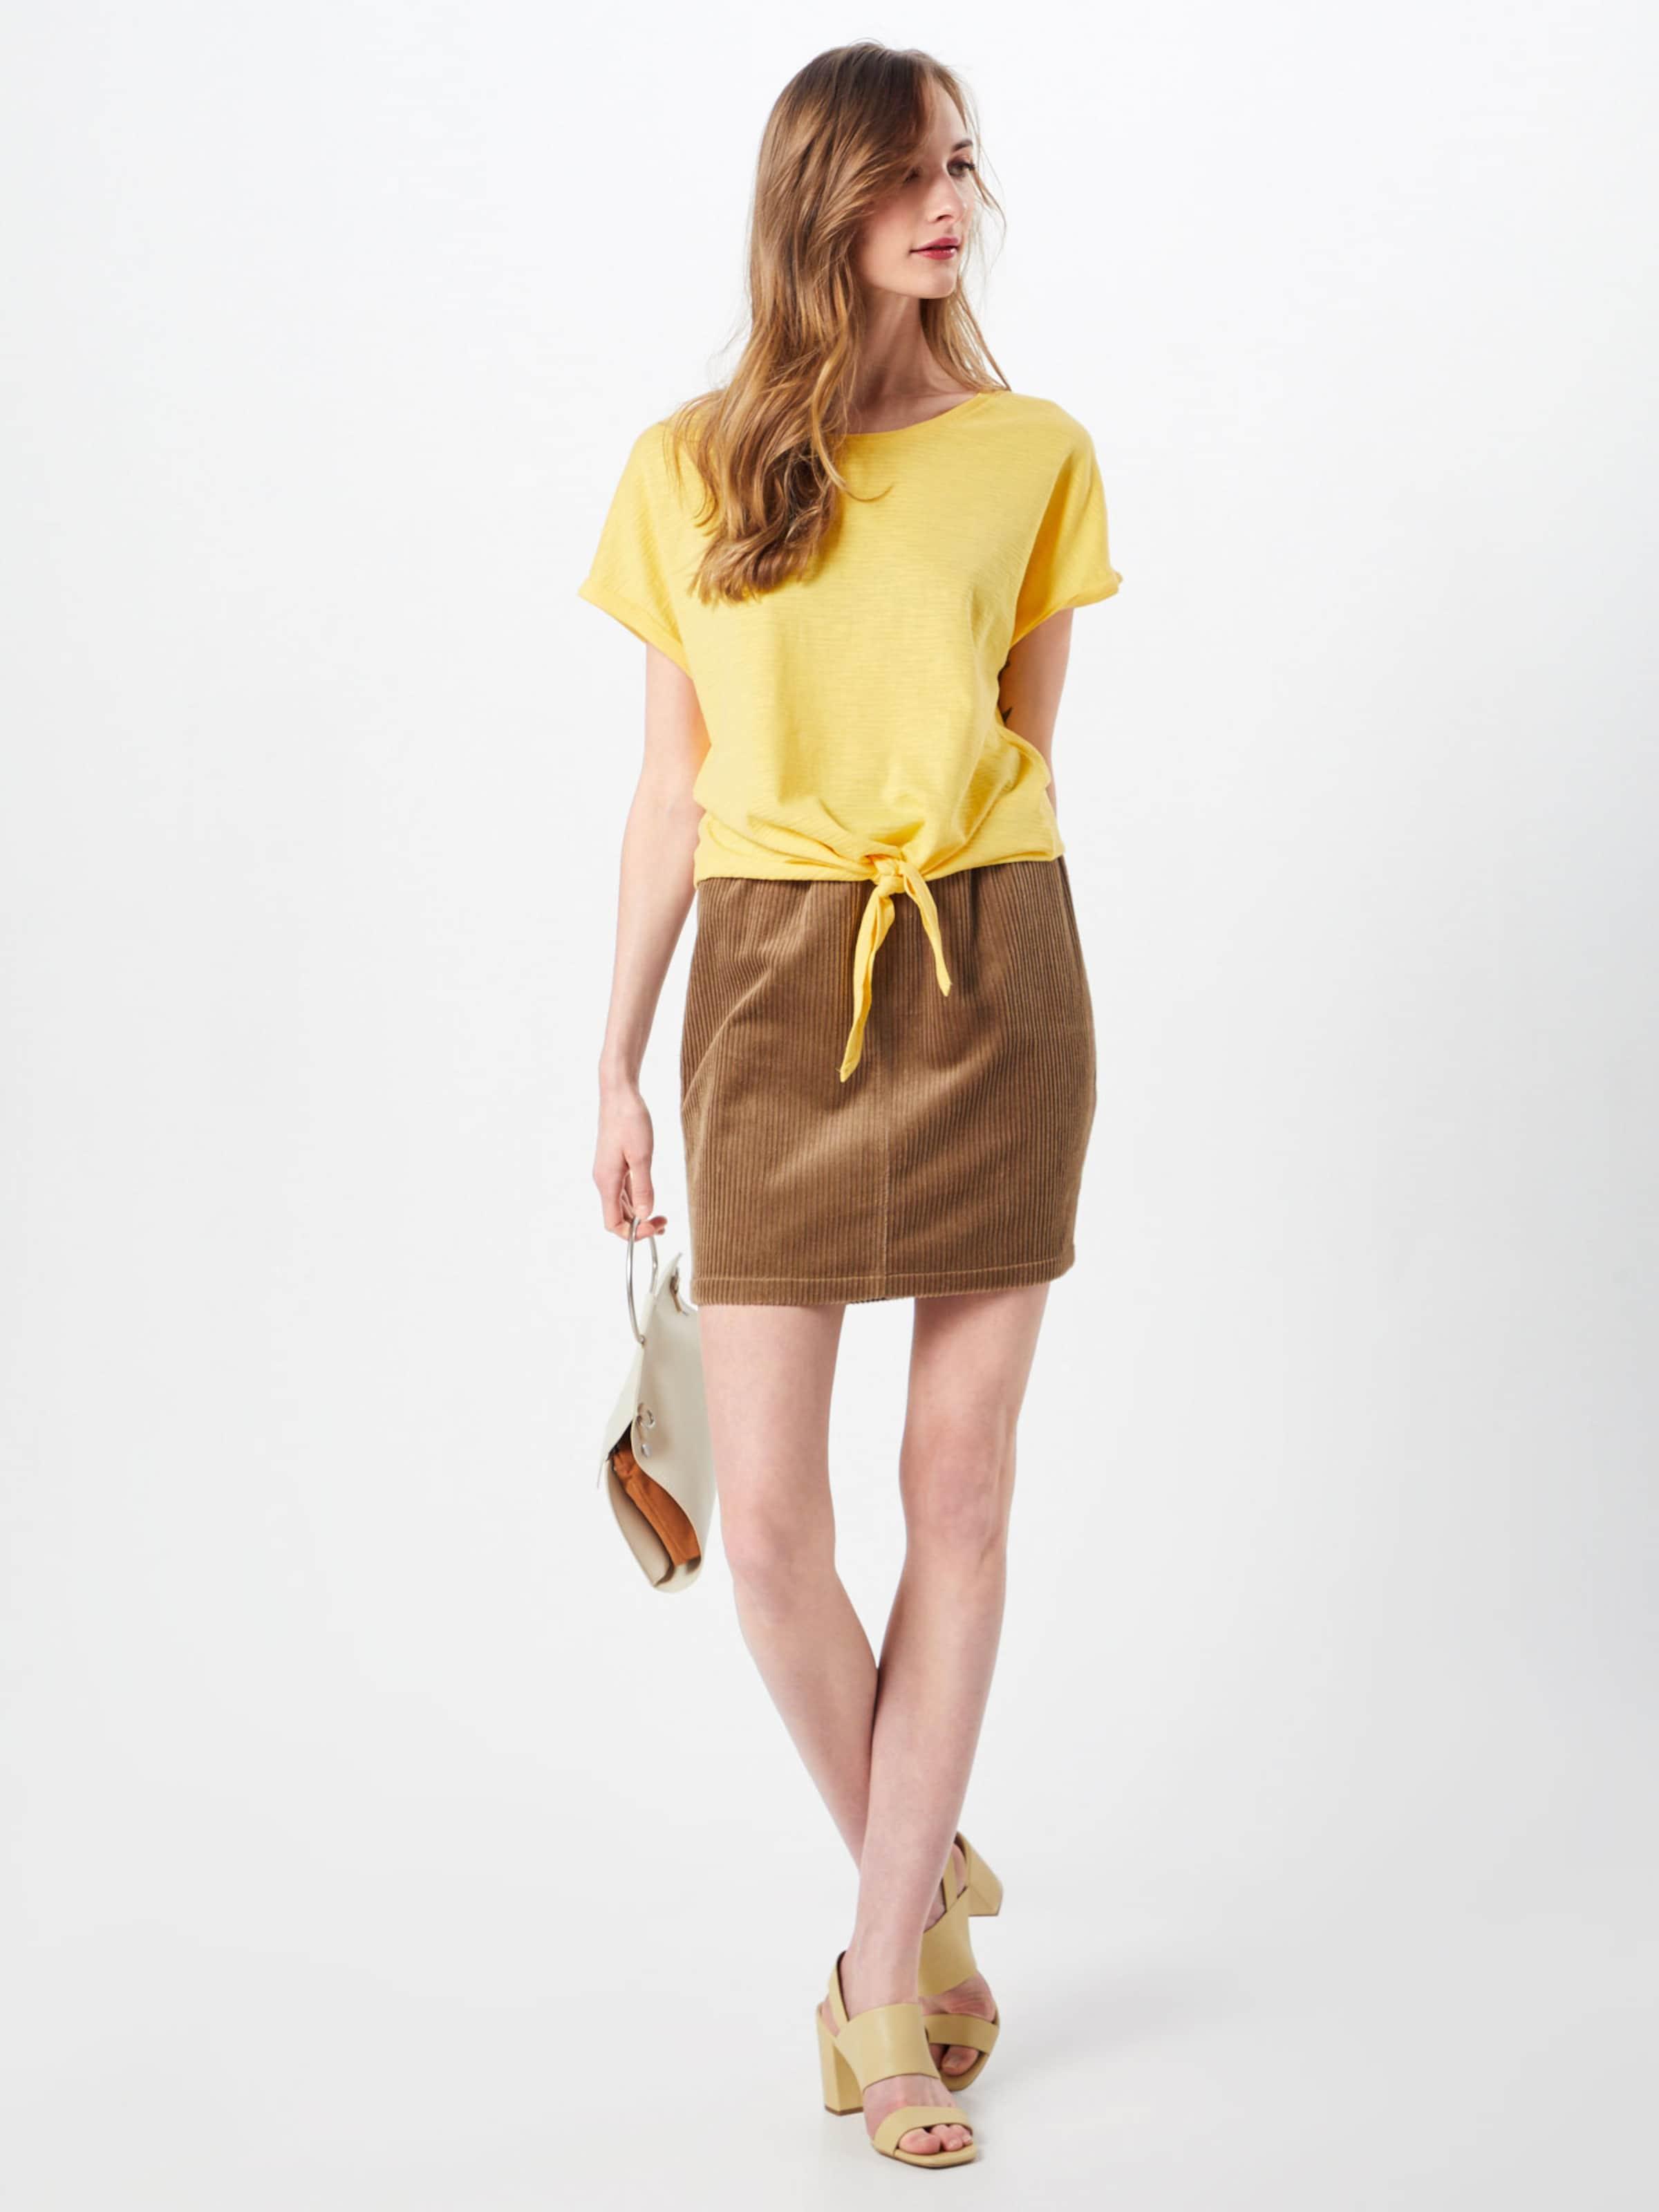 Jaune T En Tom Tailor shirt 35AjL4R